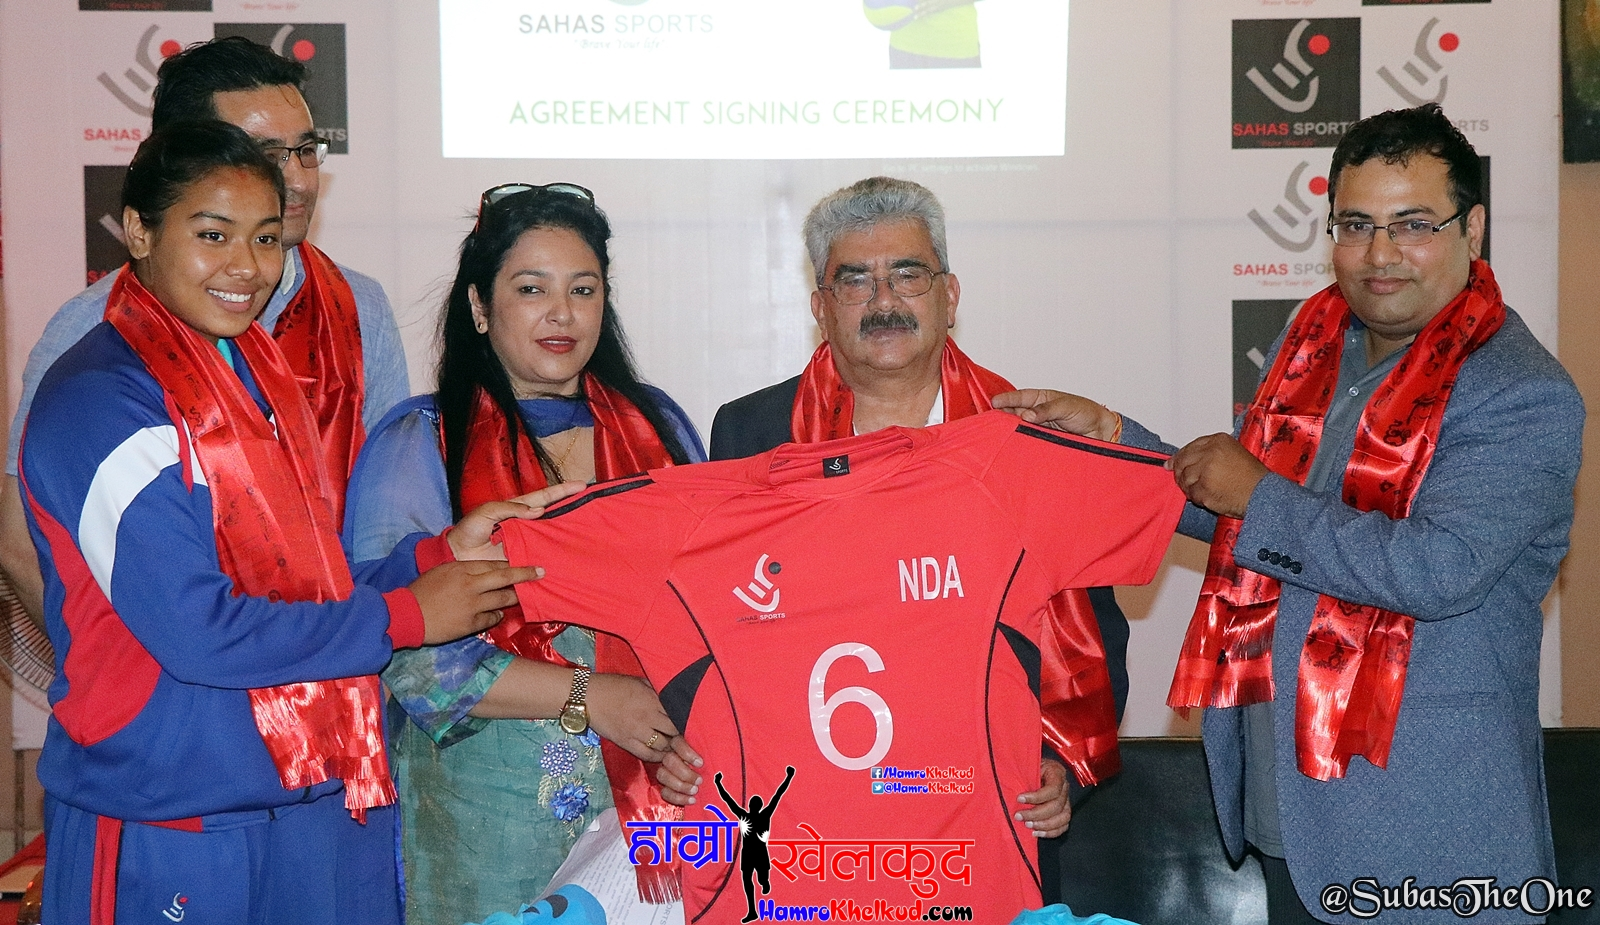 Volleyball player Pratibha appointed brand ambassador of Sahas Sports